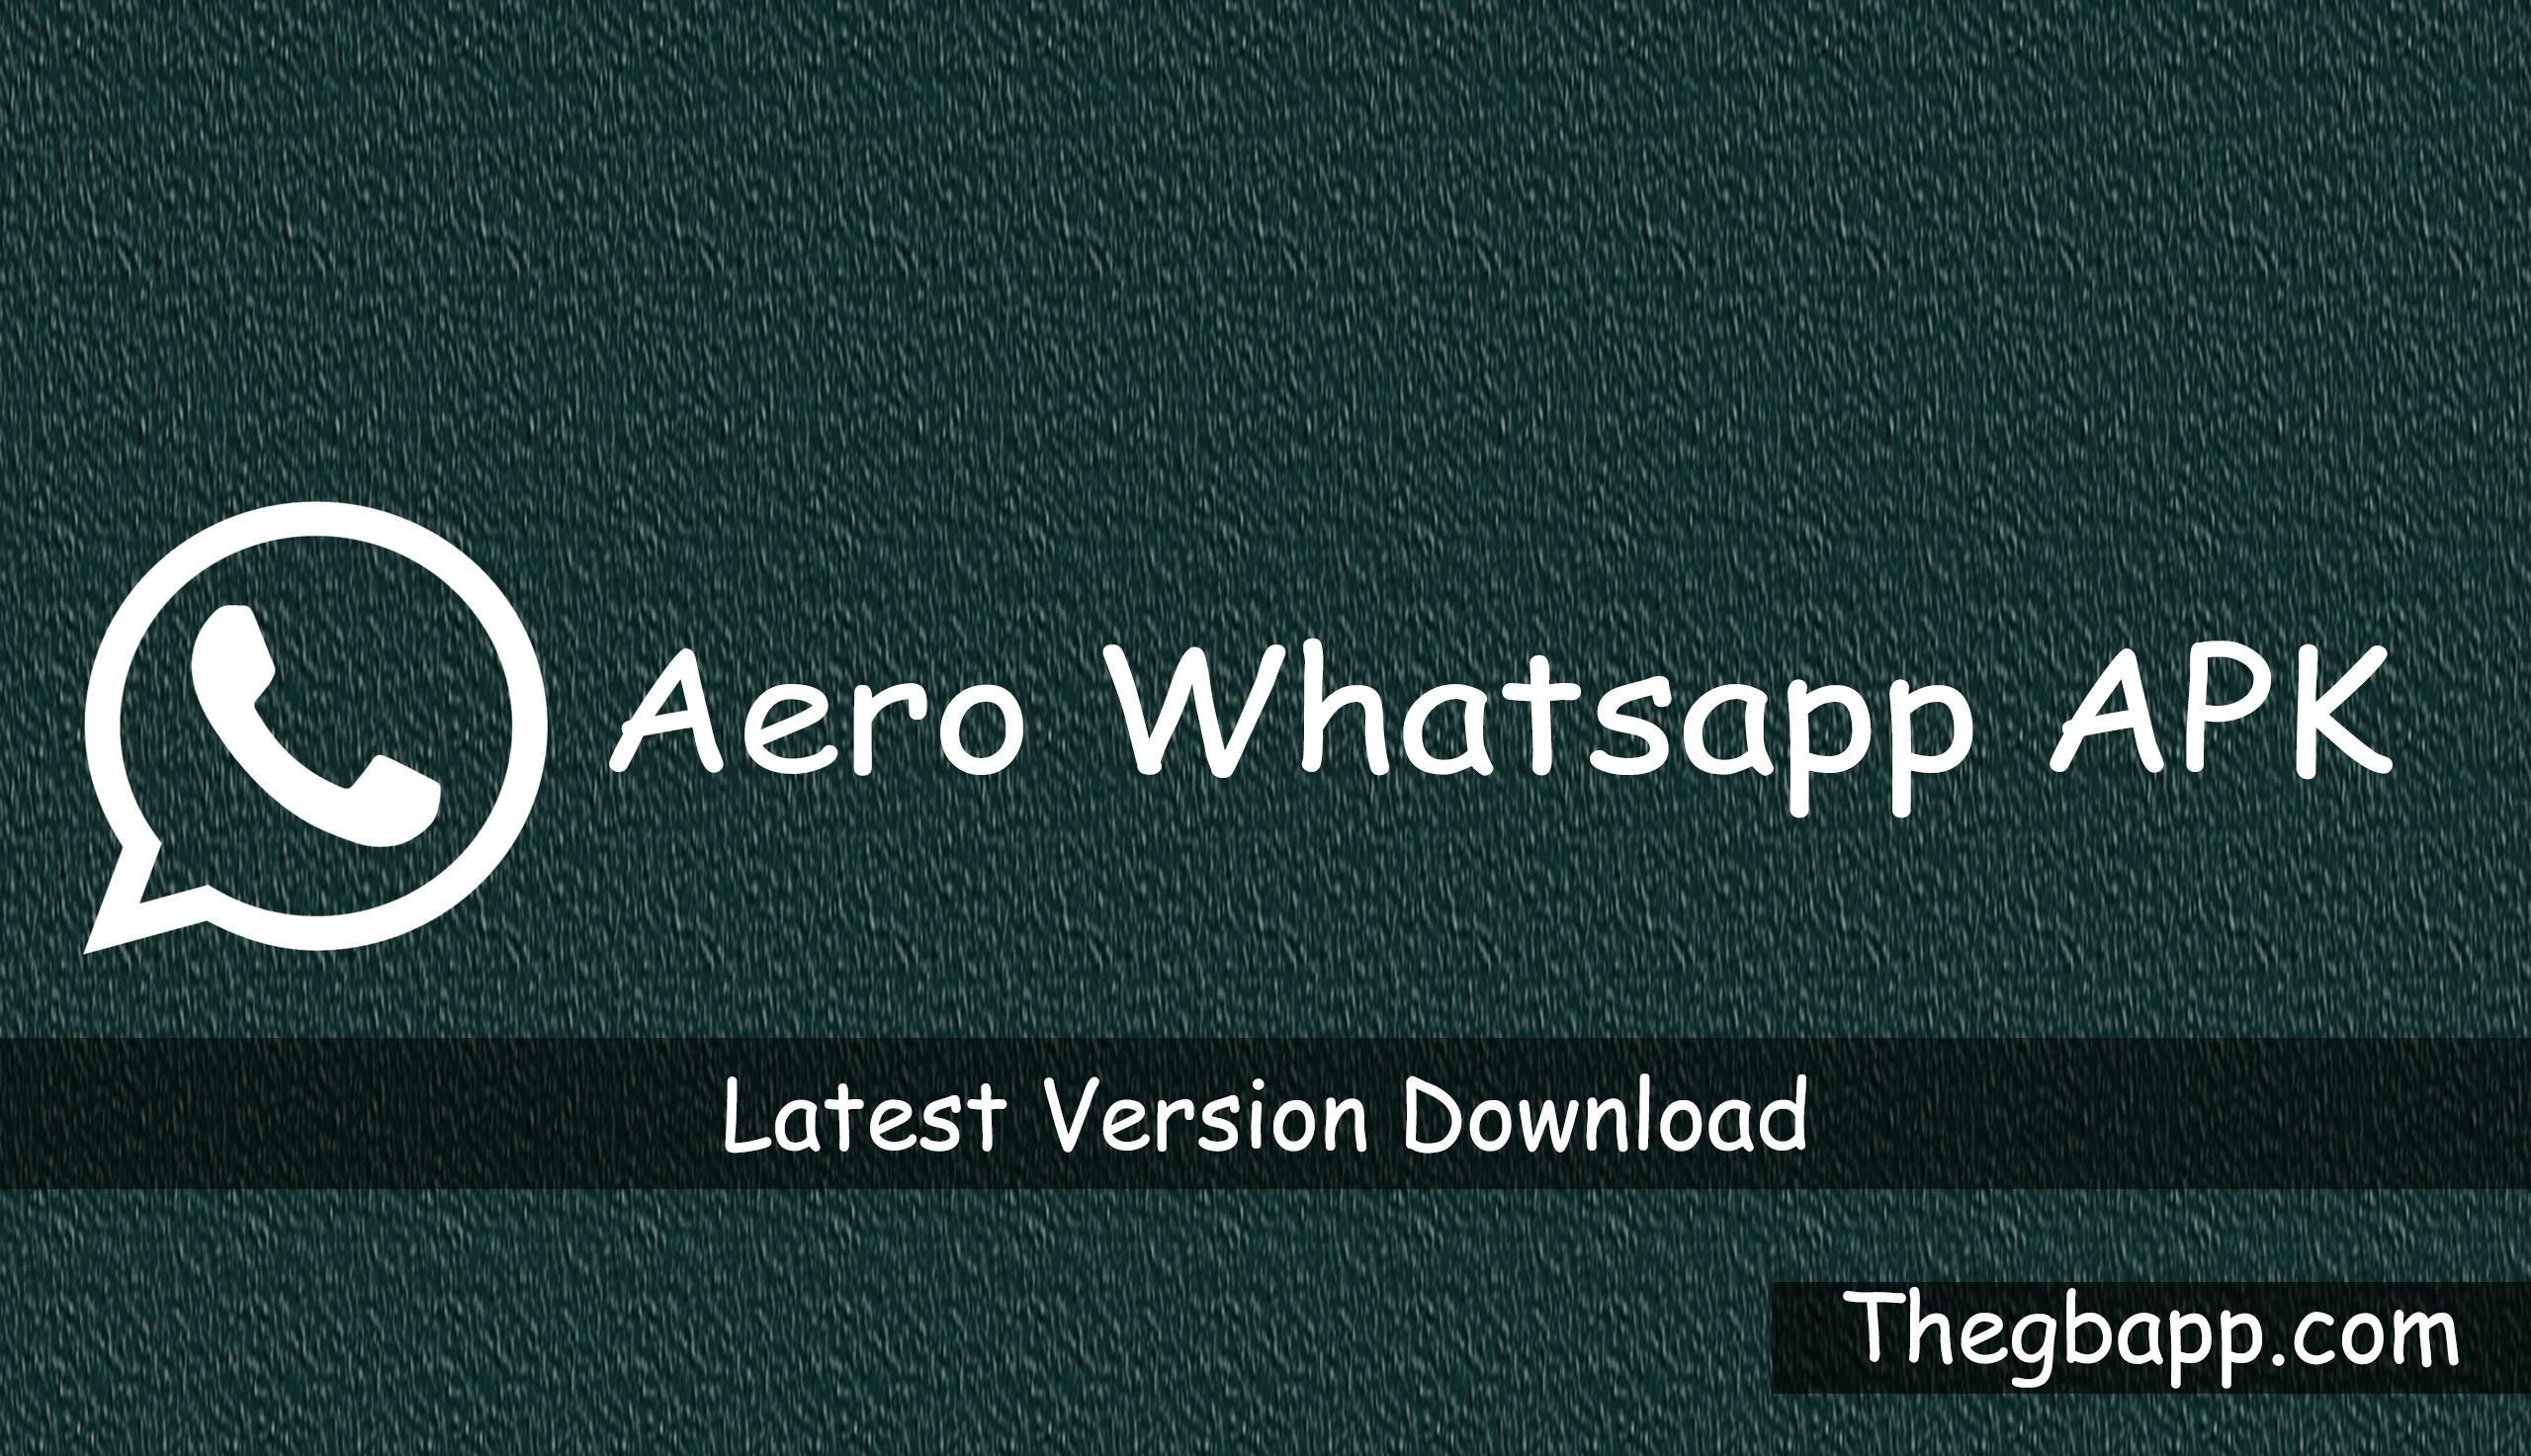 Aero Whatsapp APK